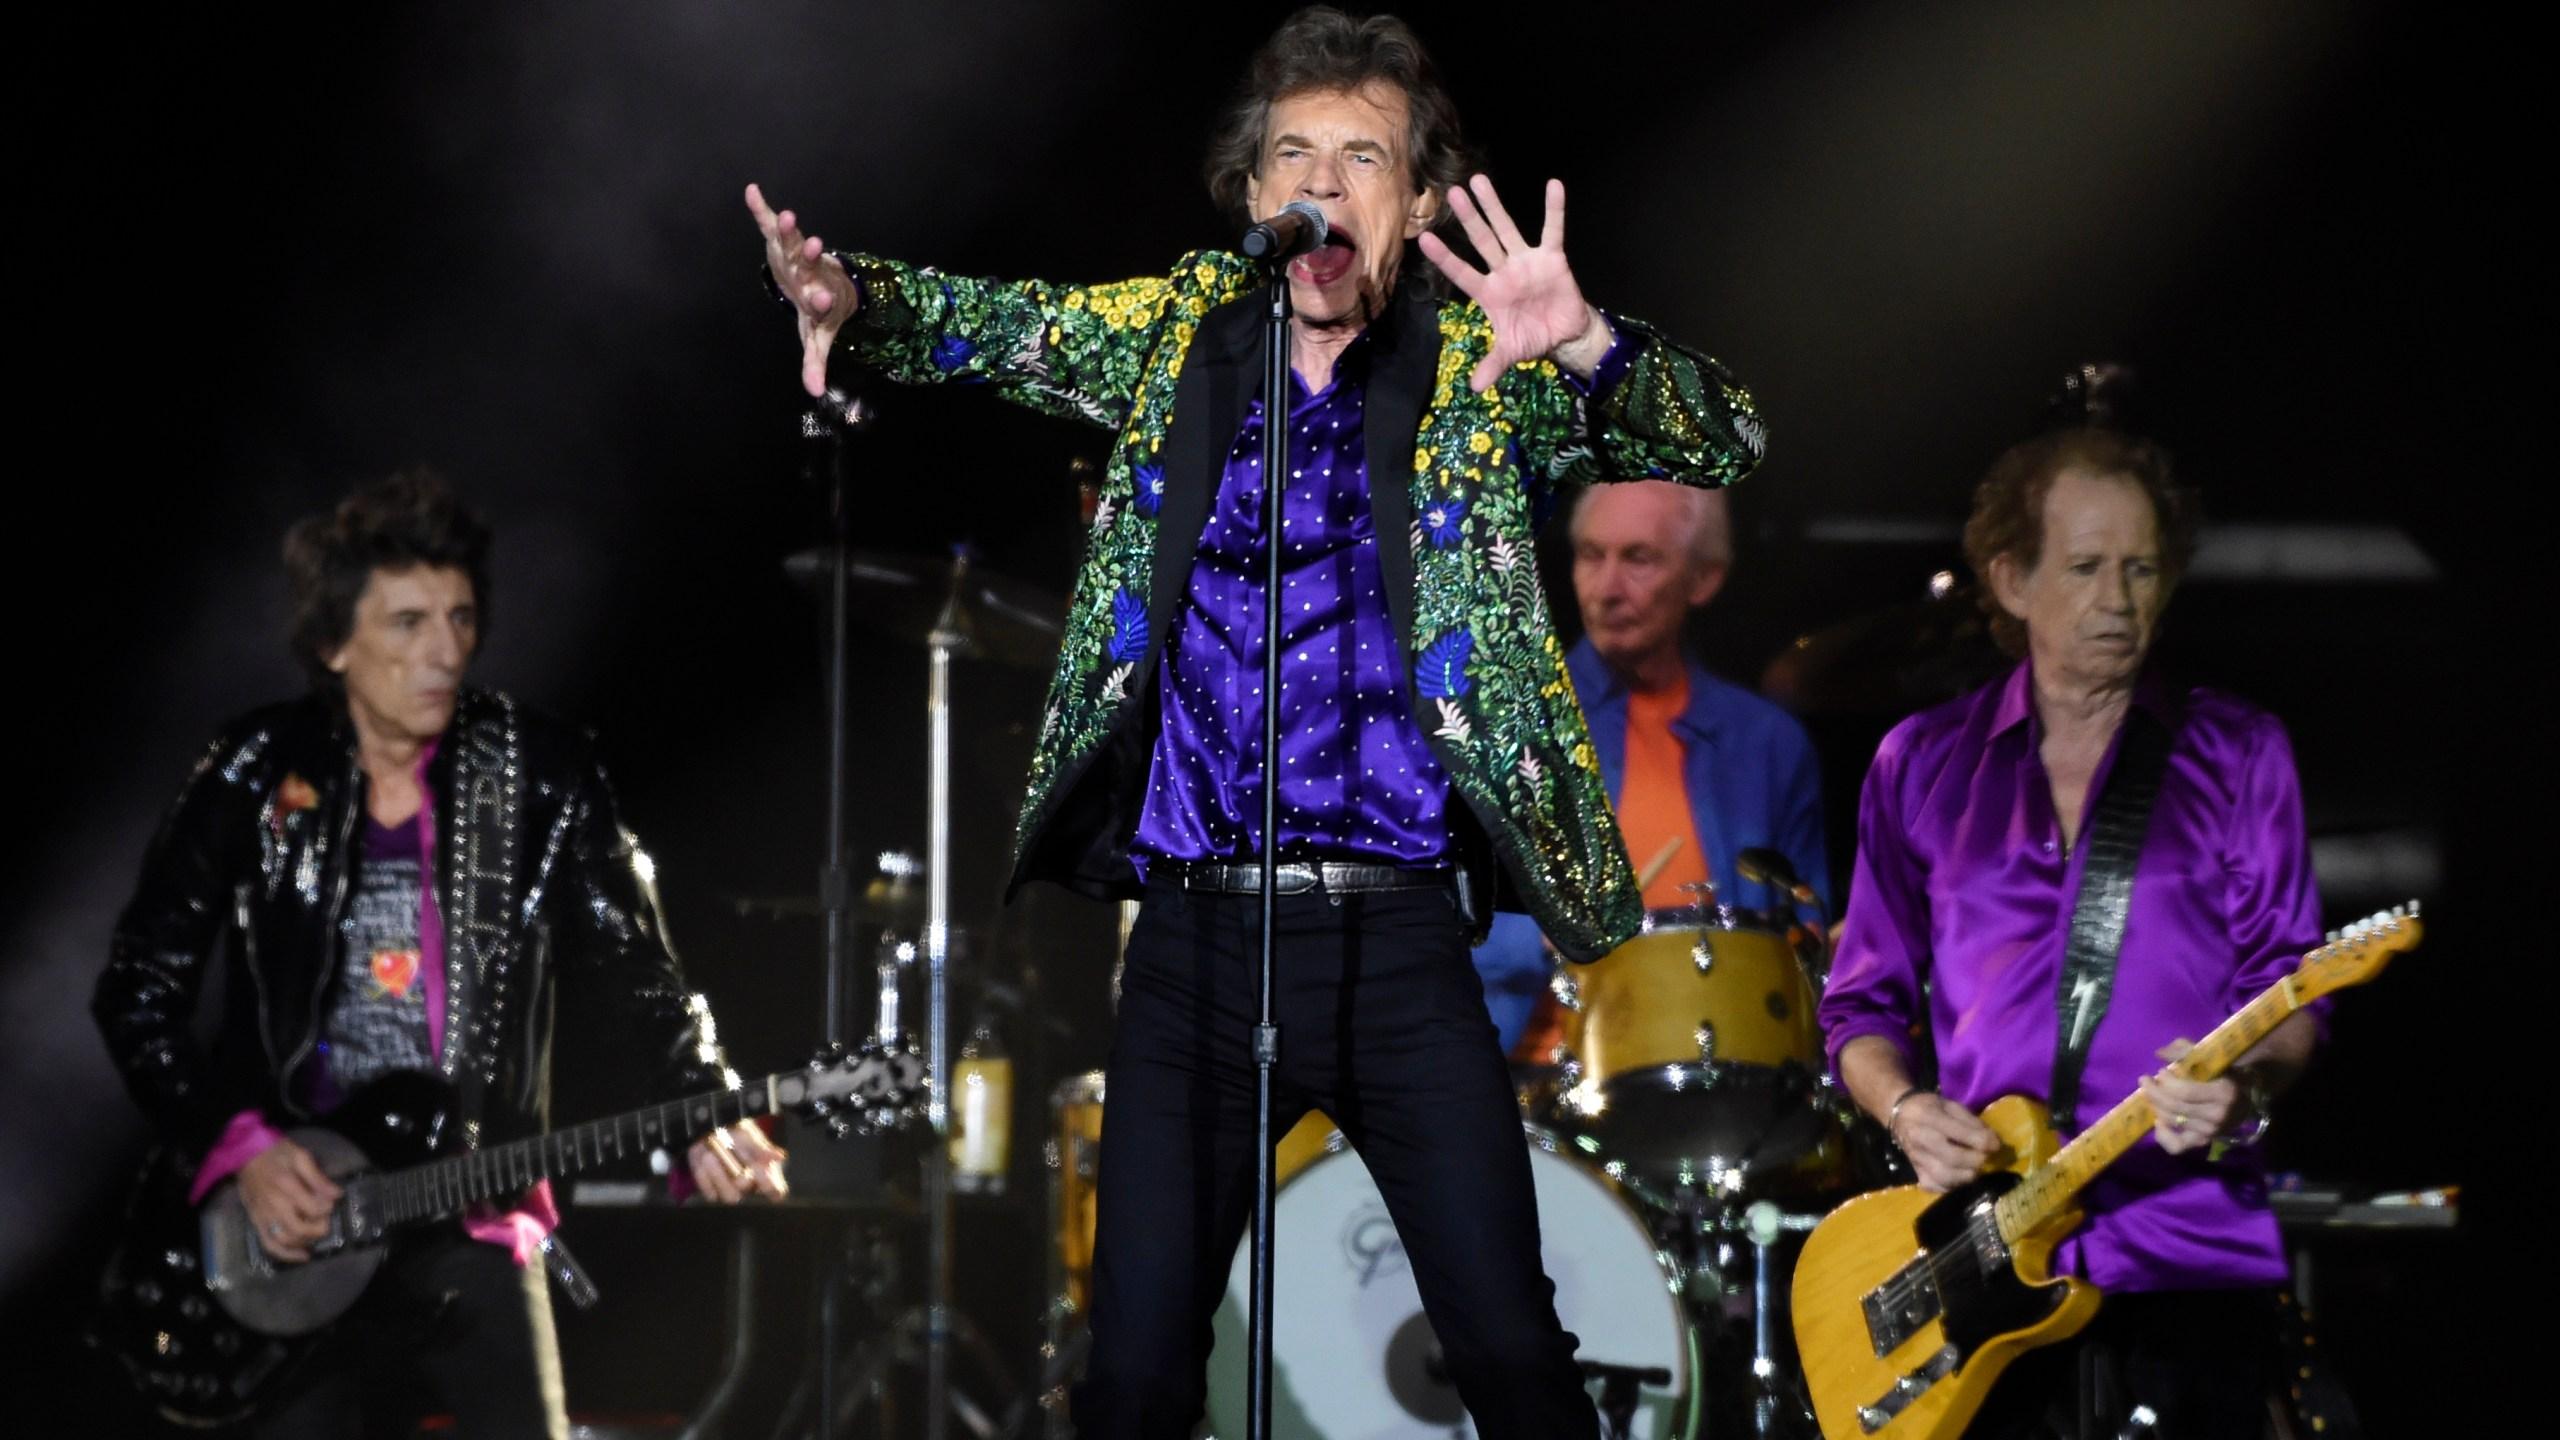 Mick Jagger, Ron Wood, Charlie Watts, Keith Richards